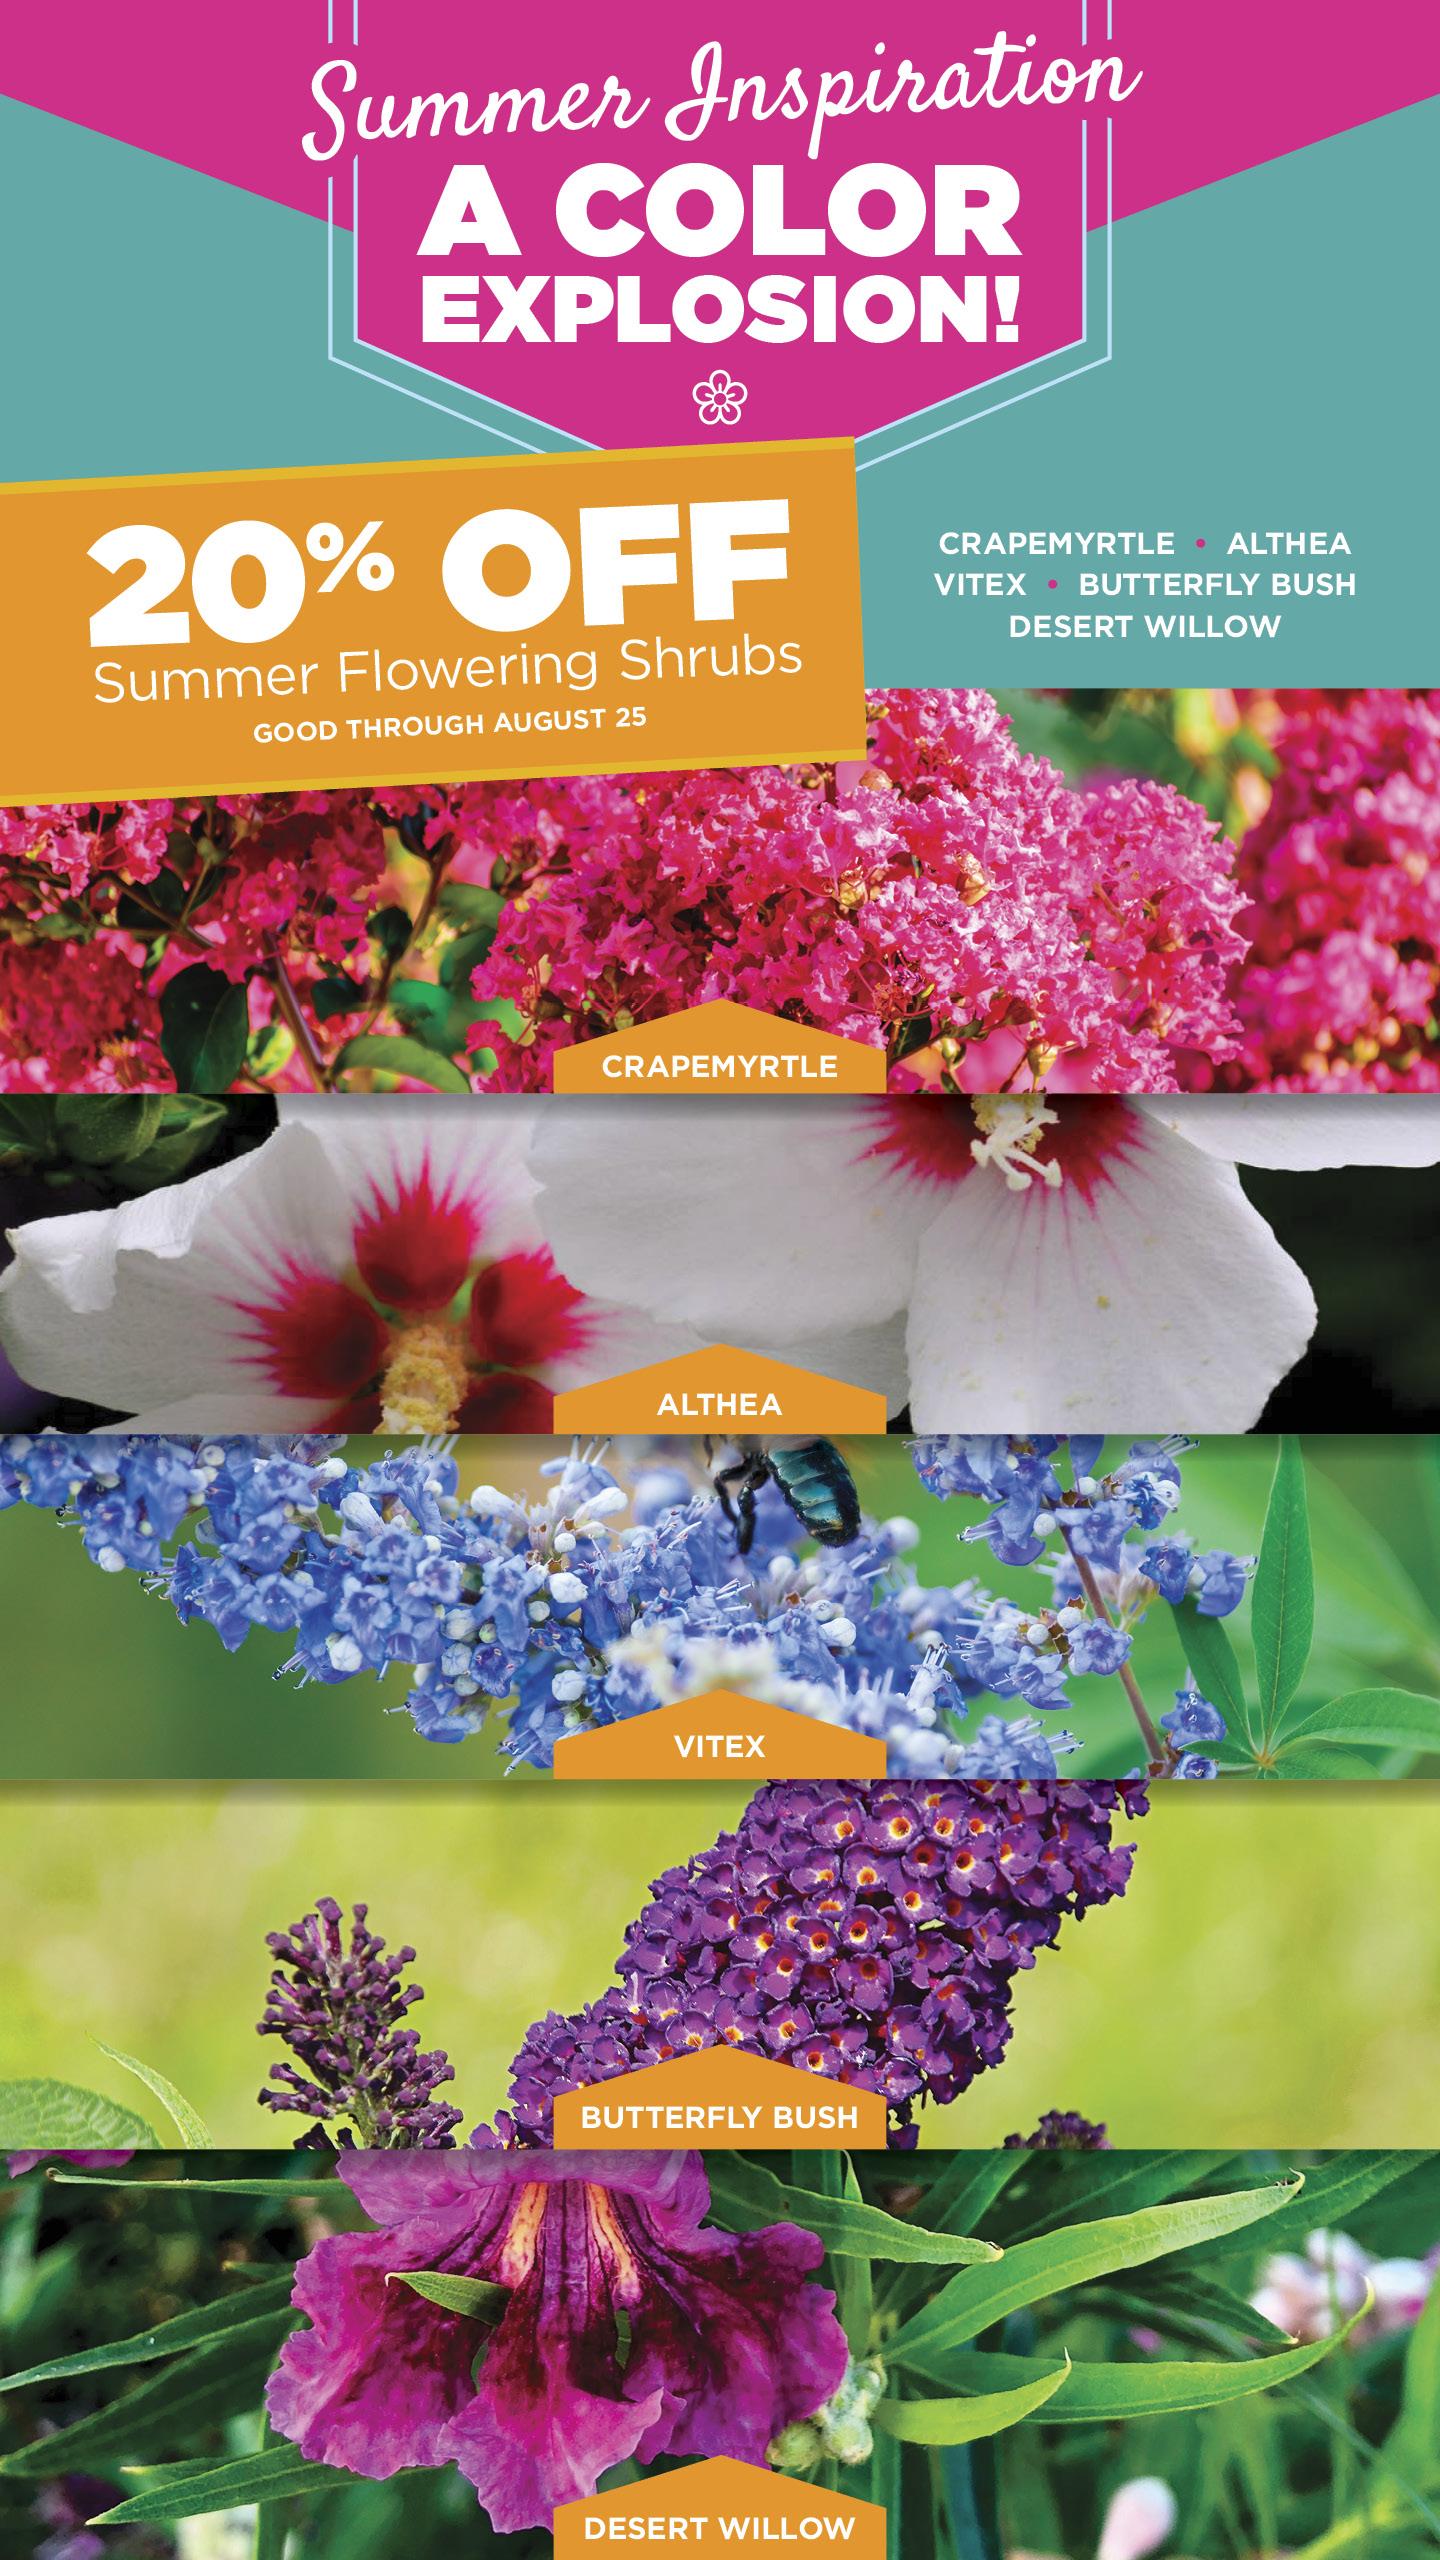 Summer Flowering Shrubs | 20% Off | TLC